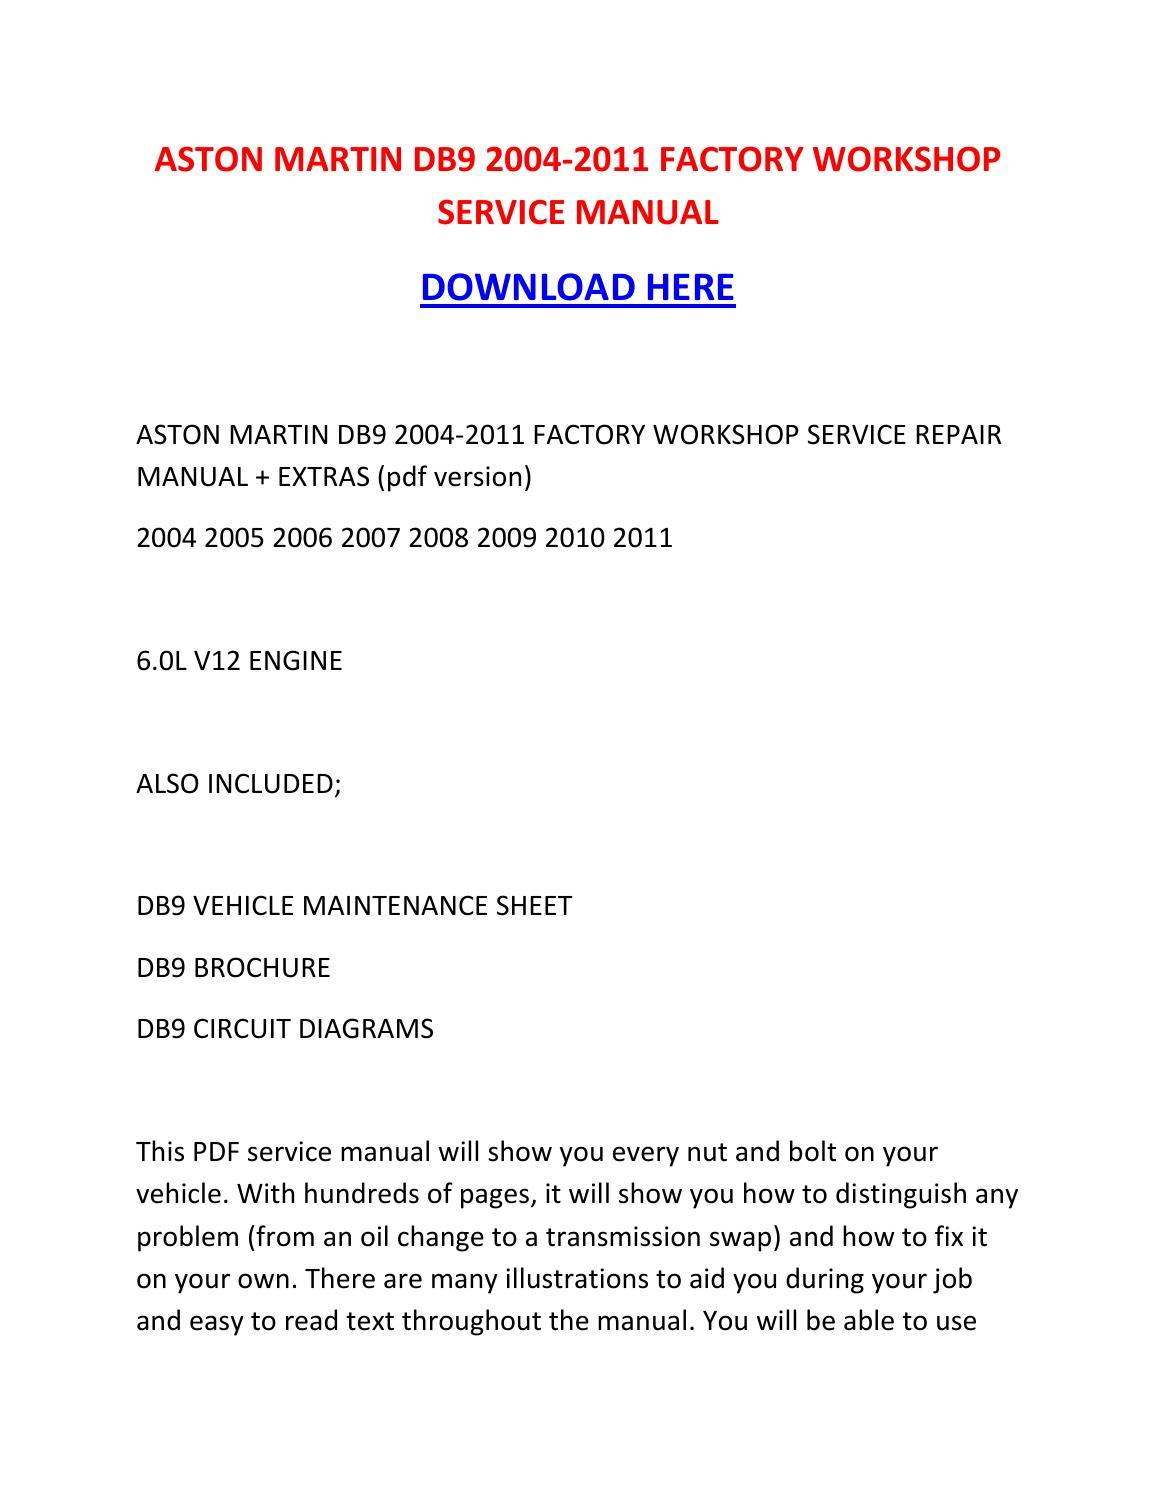 Aston Martin Db9 2004 2011 Factory Workshop Service Manual